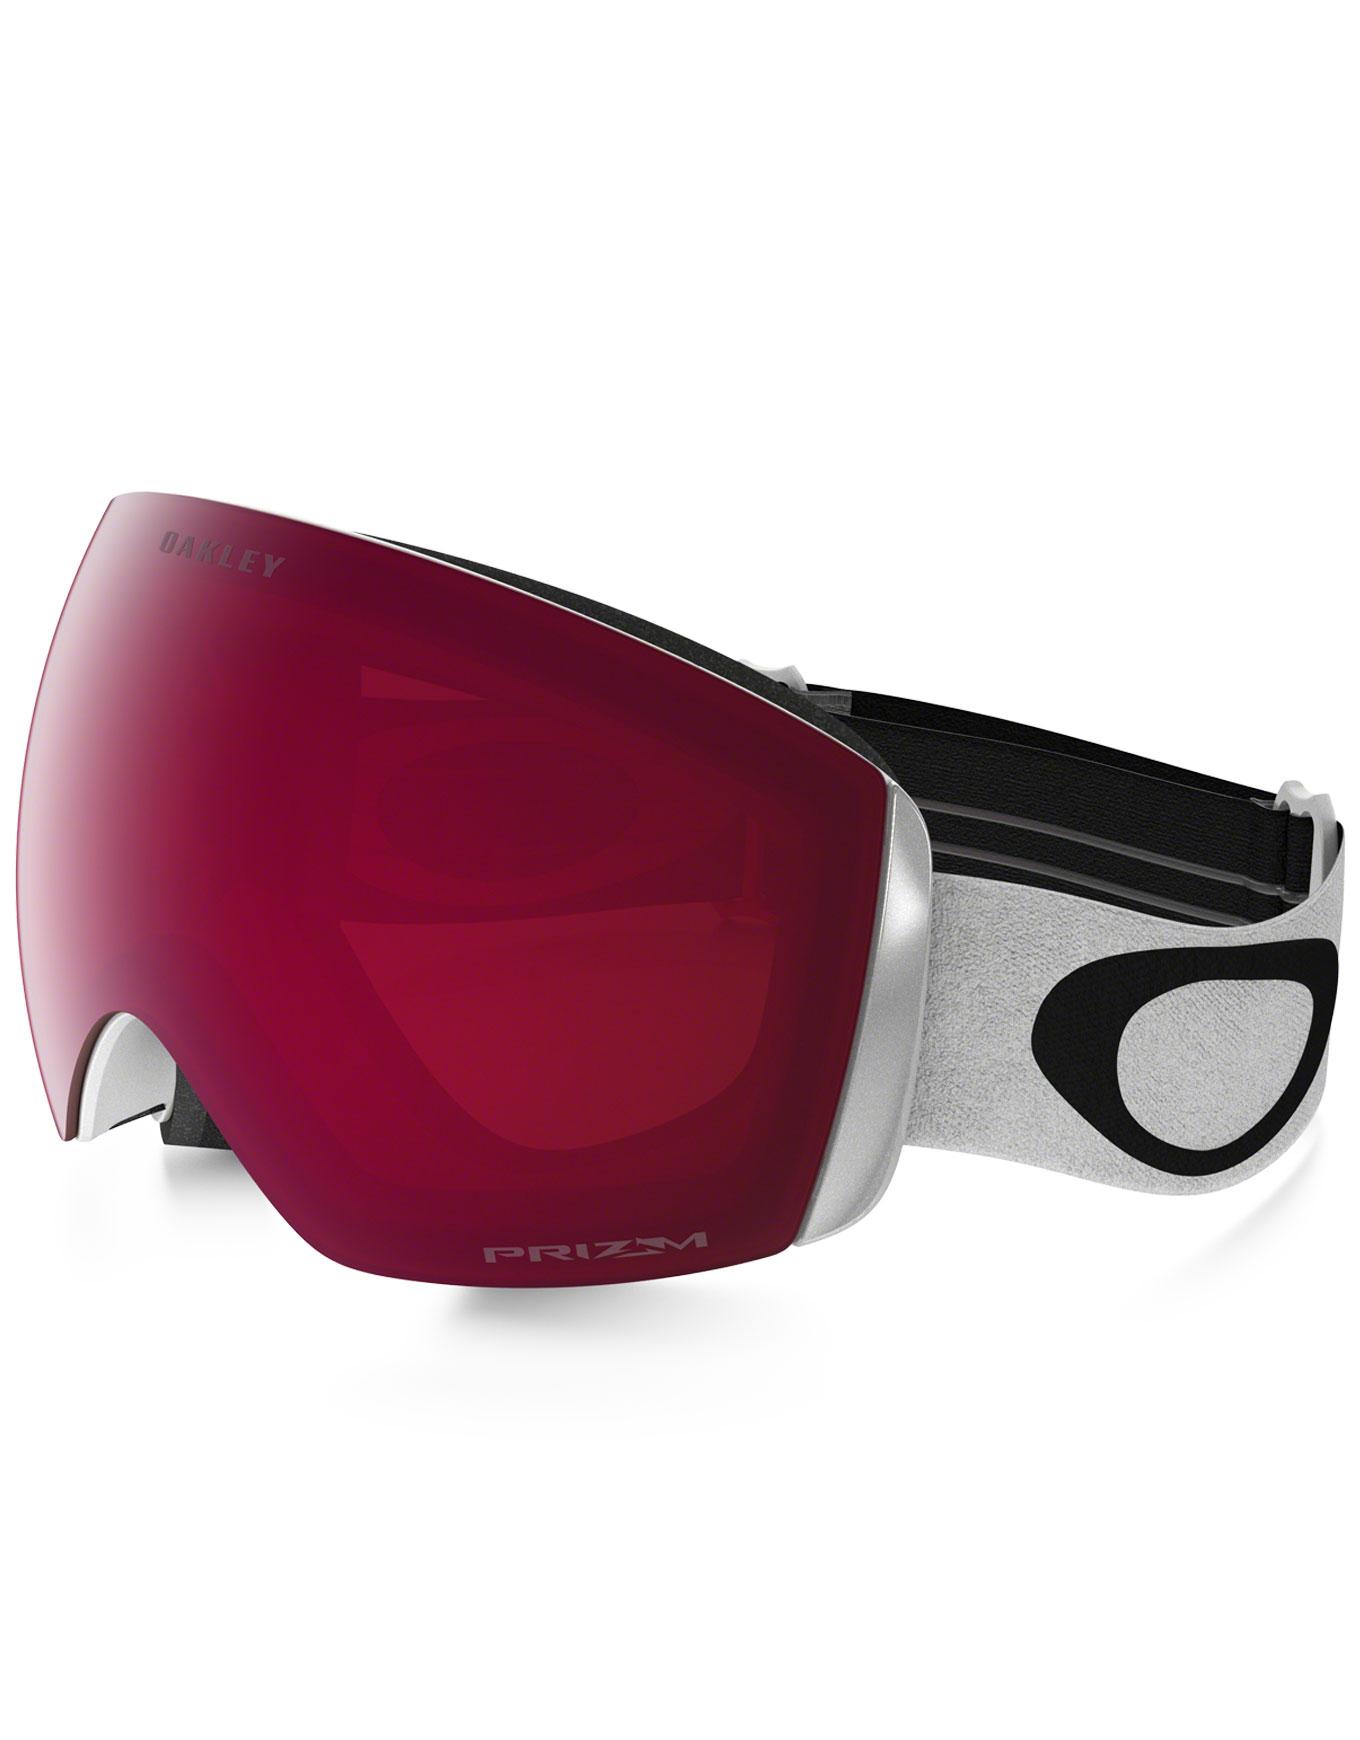 Masque de Ski Oakley Flight Deck Matte Black Prizm Rose par